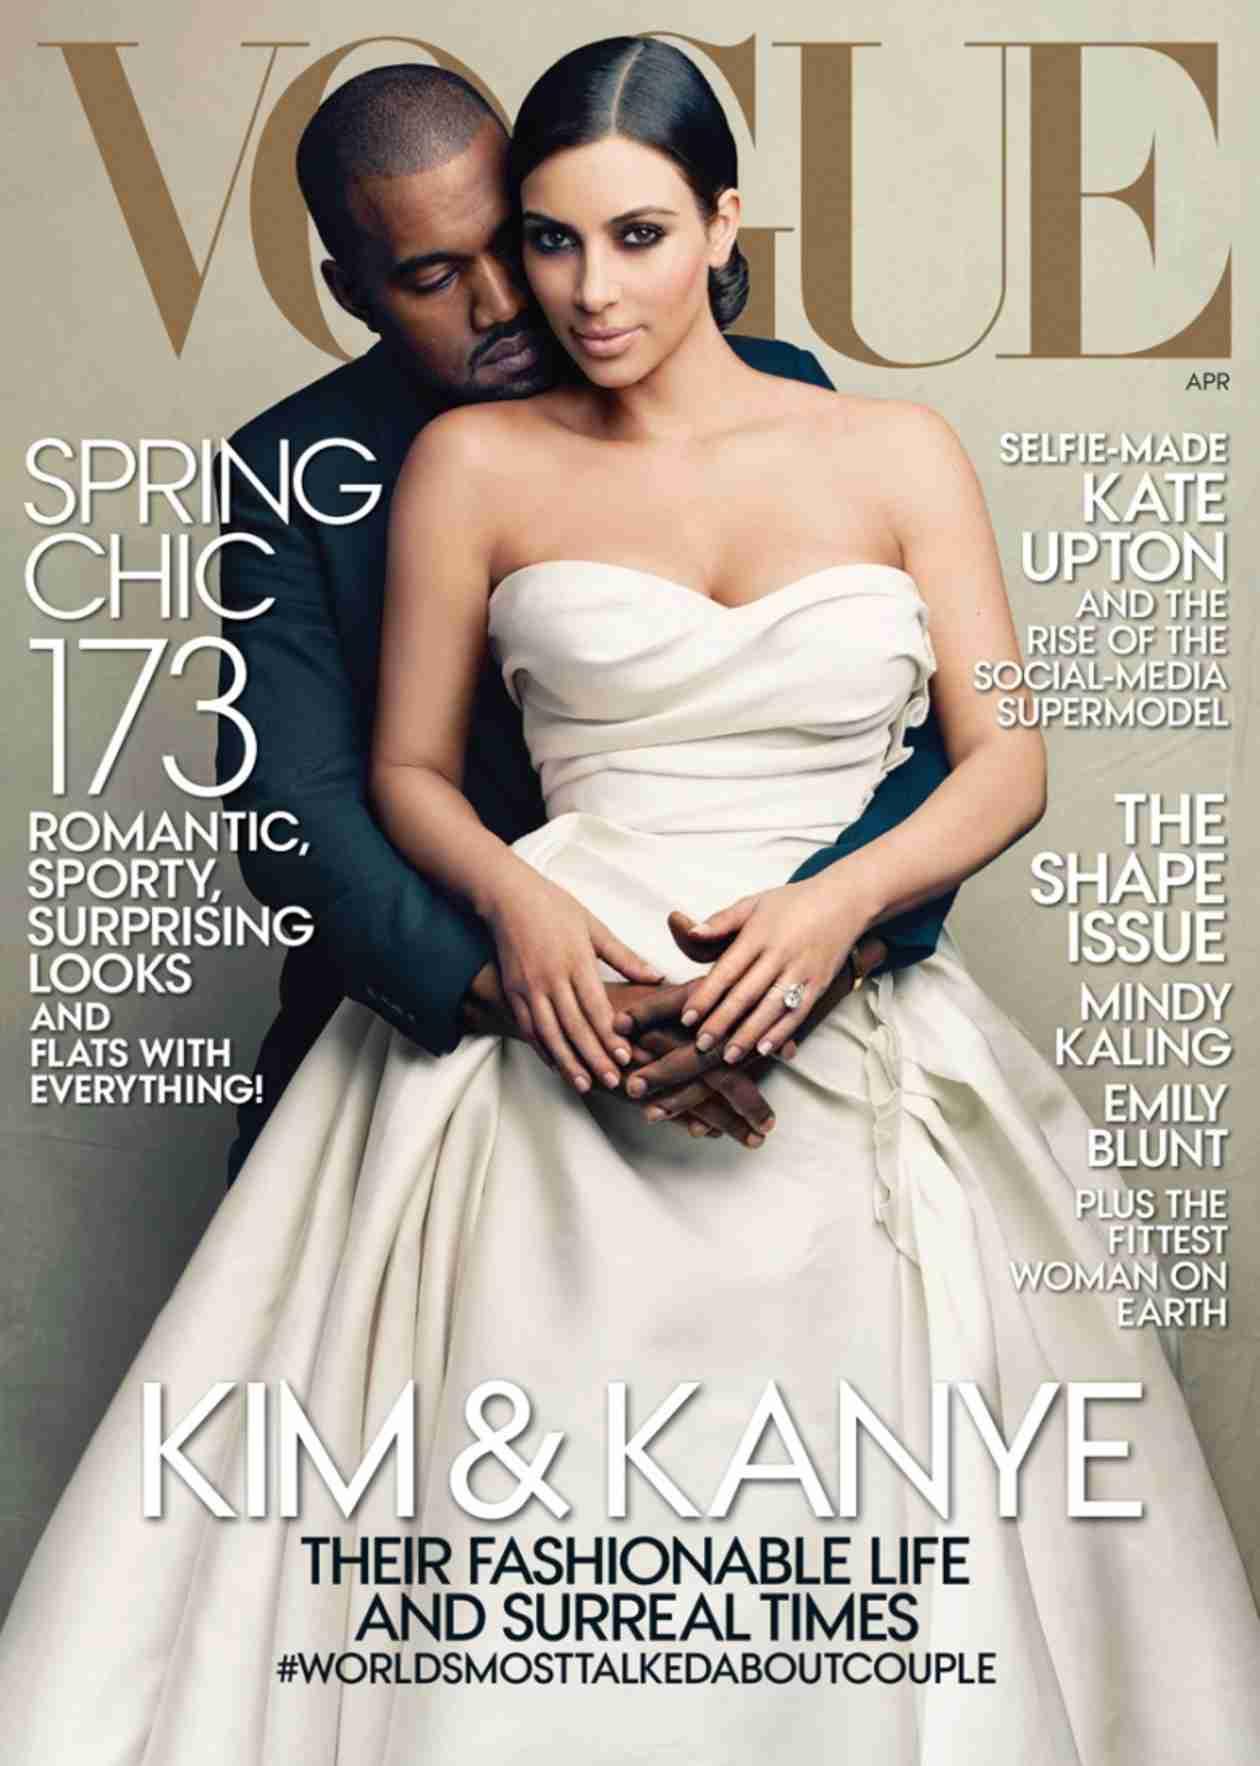 Celebs Support Kim Kardashian's Vogue Cover After Sarah Michelle Gellar Slam